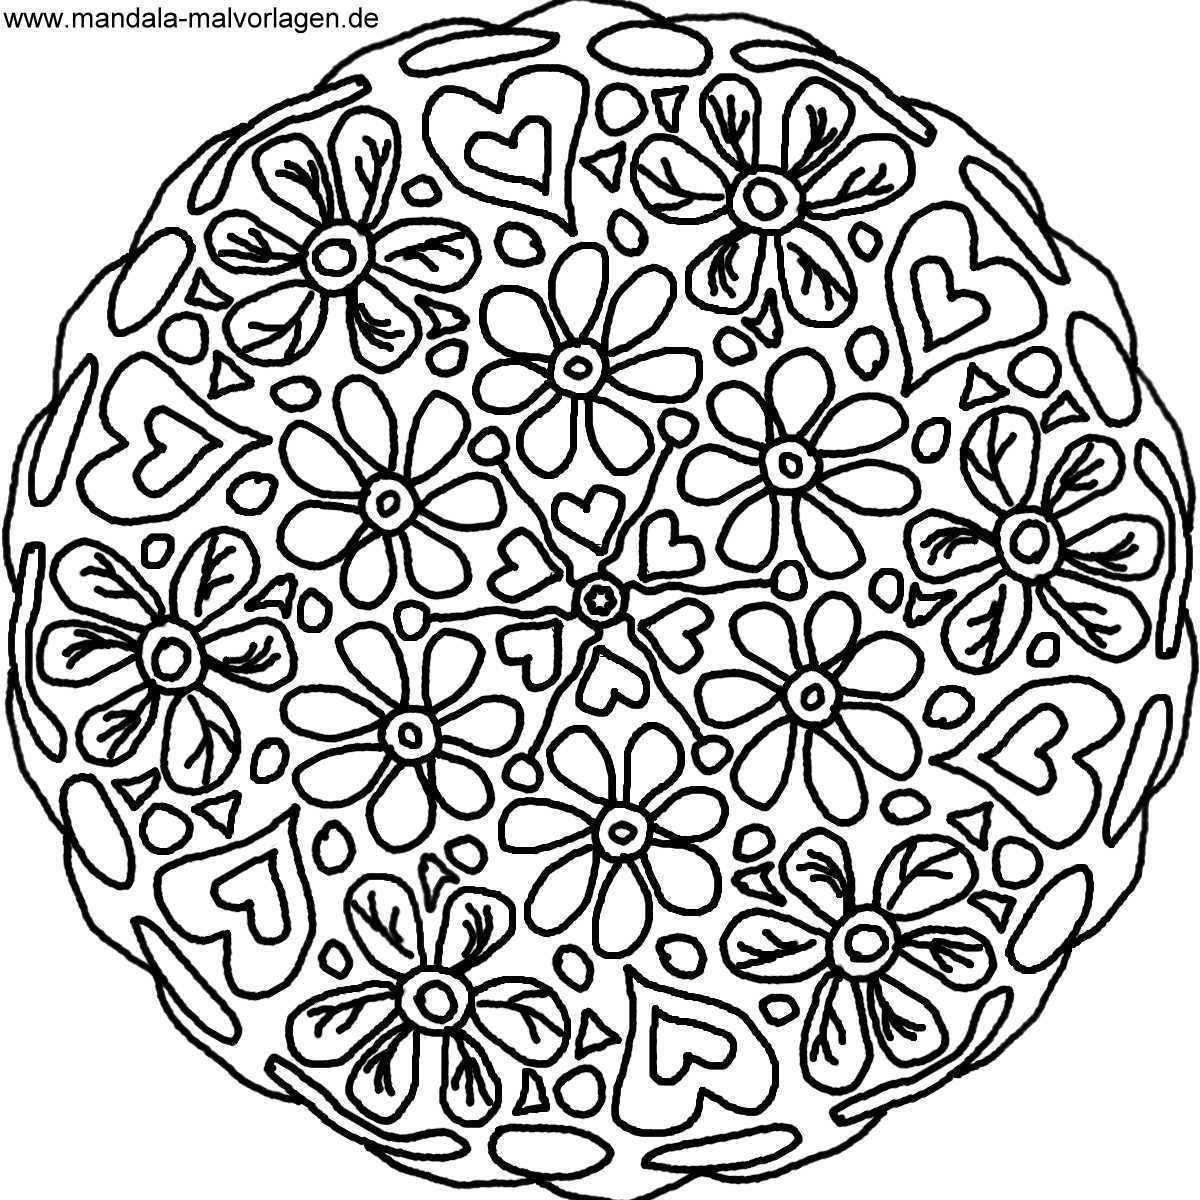 Ausmalbild Blumen Mandala Malvorlage Jpg 1200 1200 Malvorlagen Malvorlagen Blumen Ausmalen